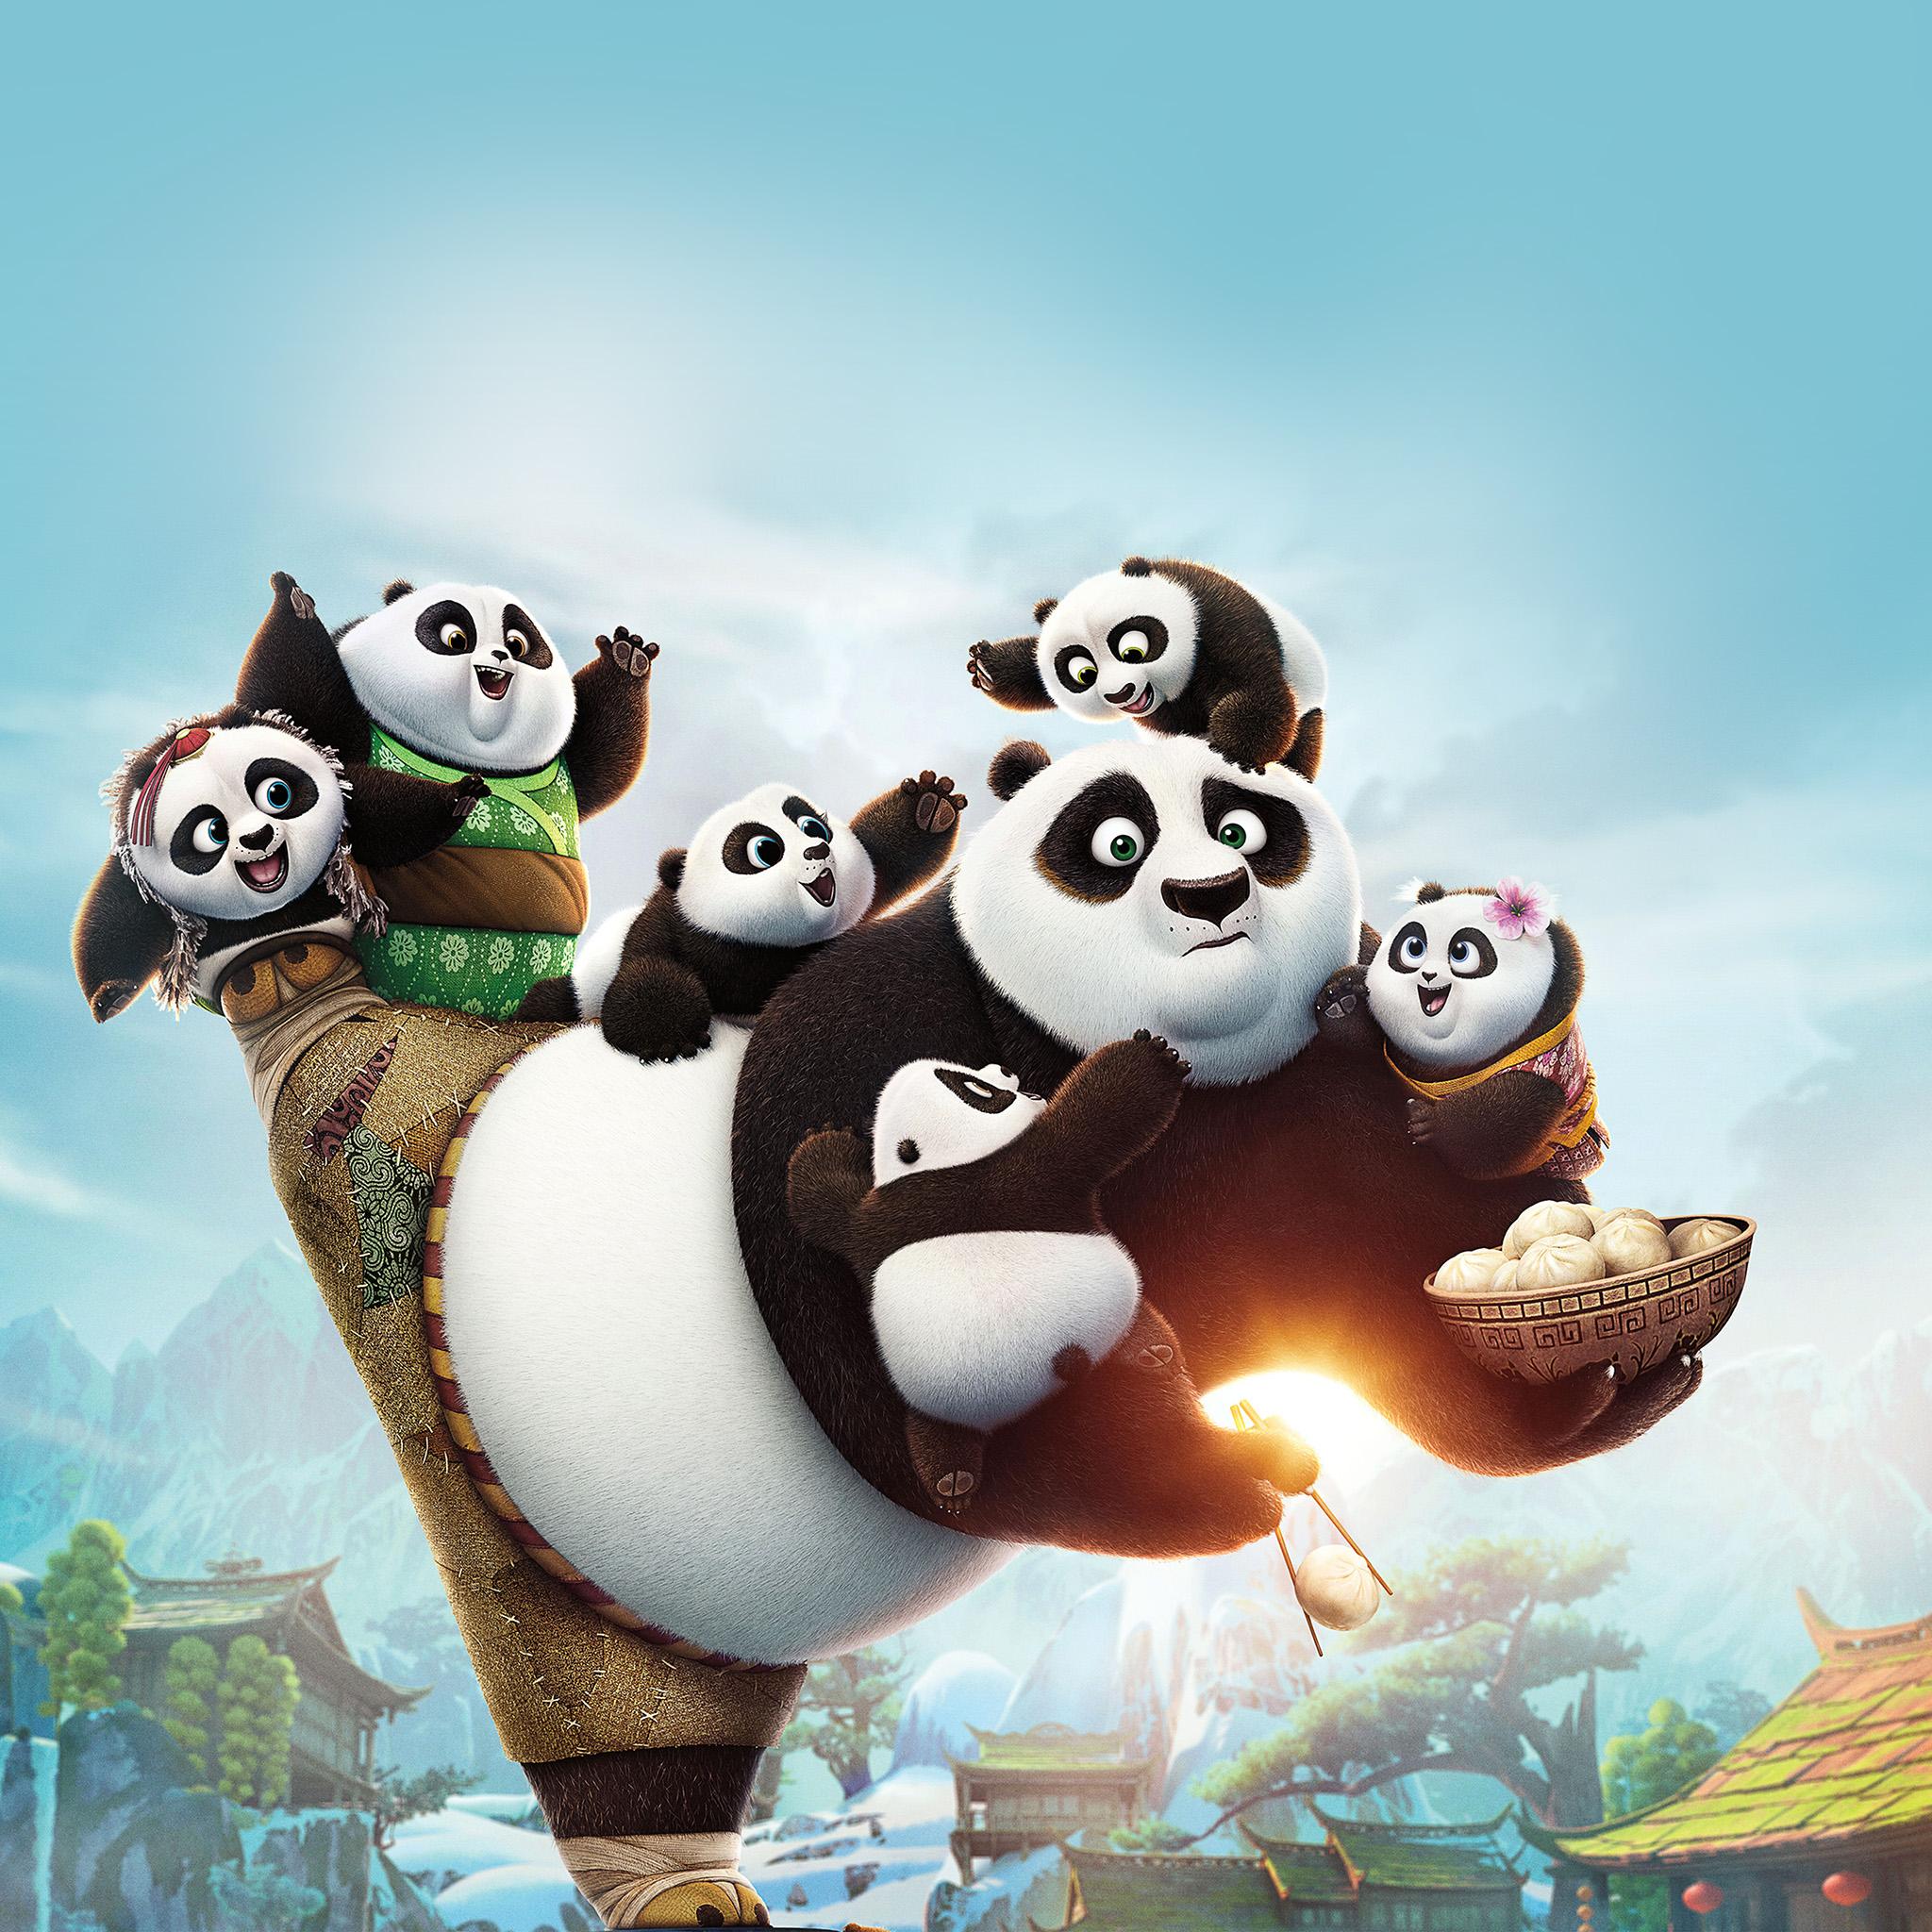 Bd01 kungfu panda anime picture art illustration wallpaper - Panda anime wallpaper ...